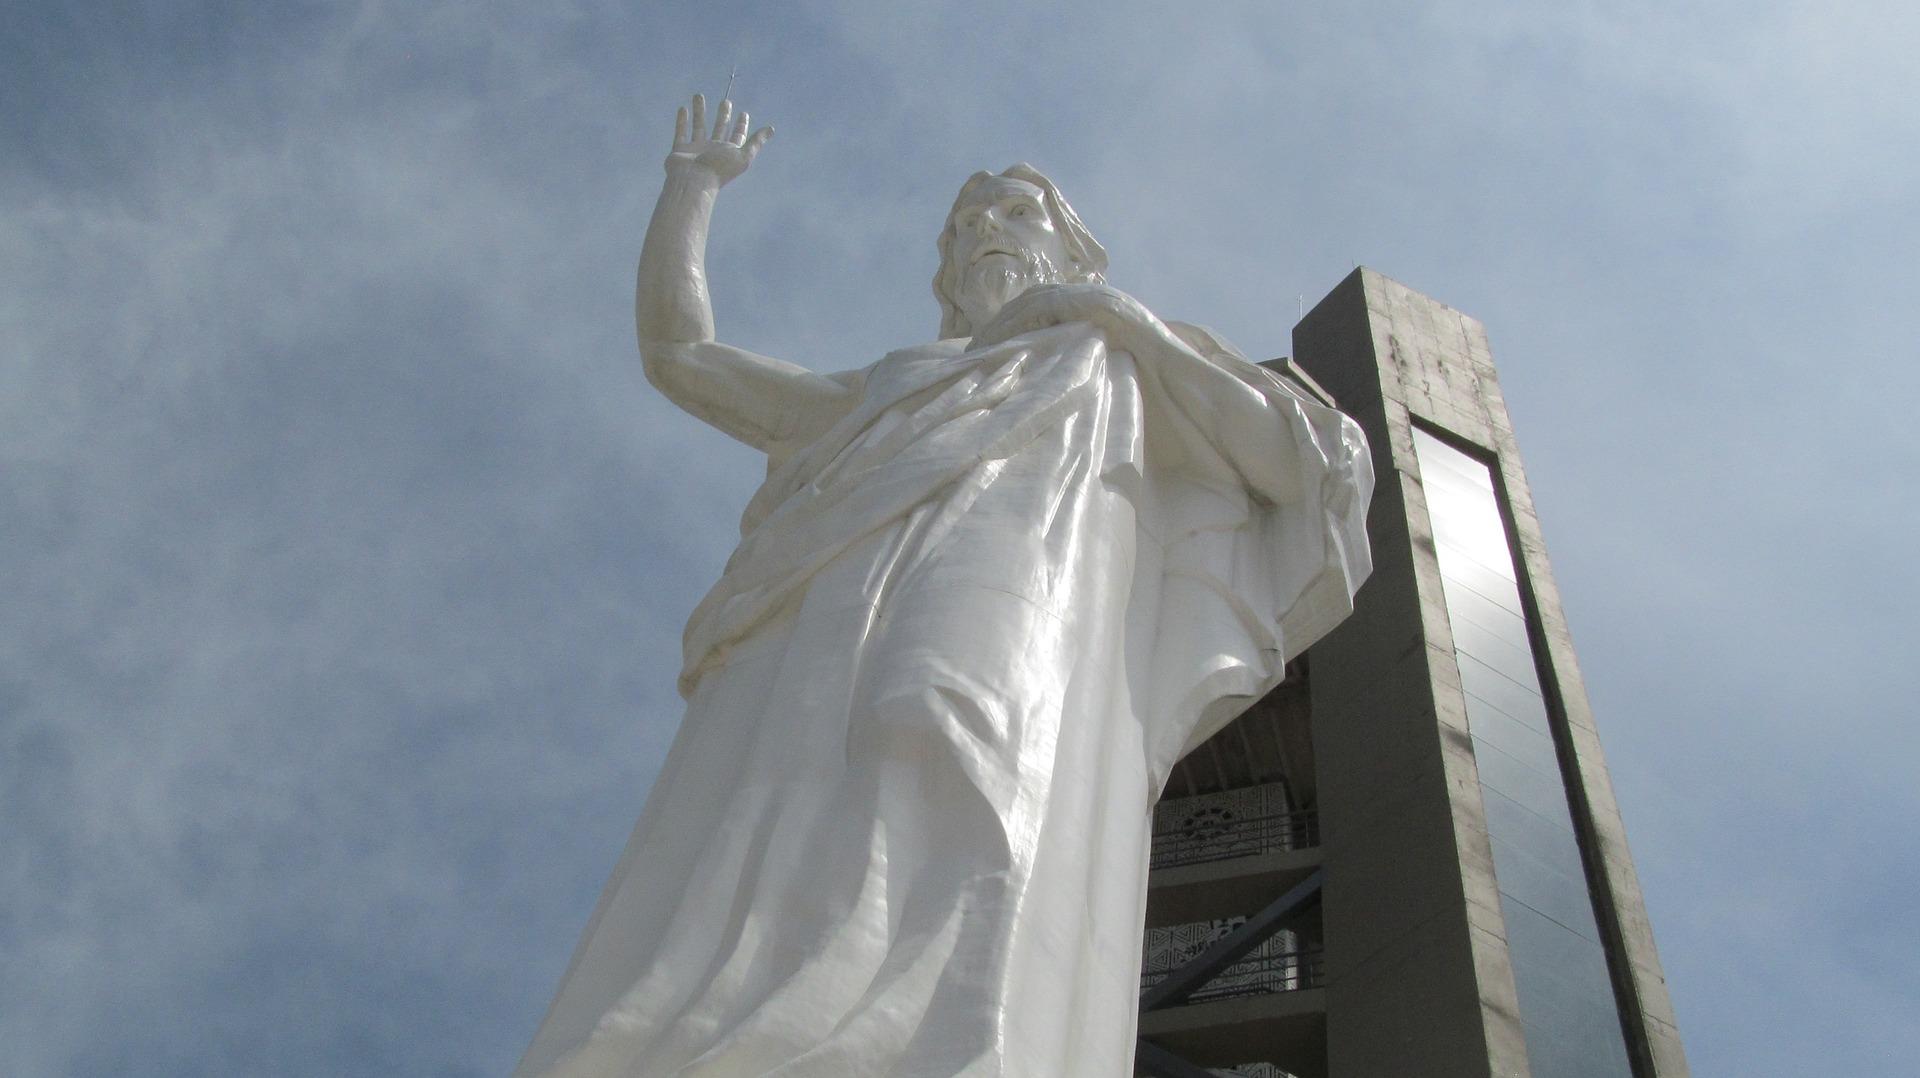 festivales y ferias de bucaramanga